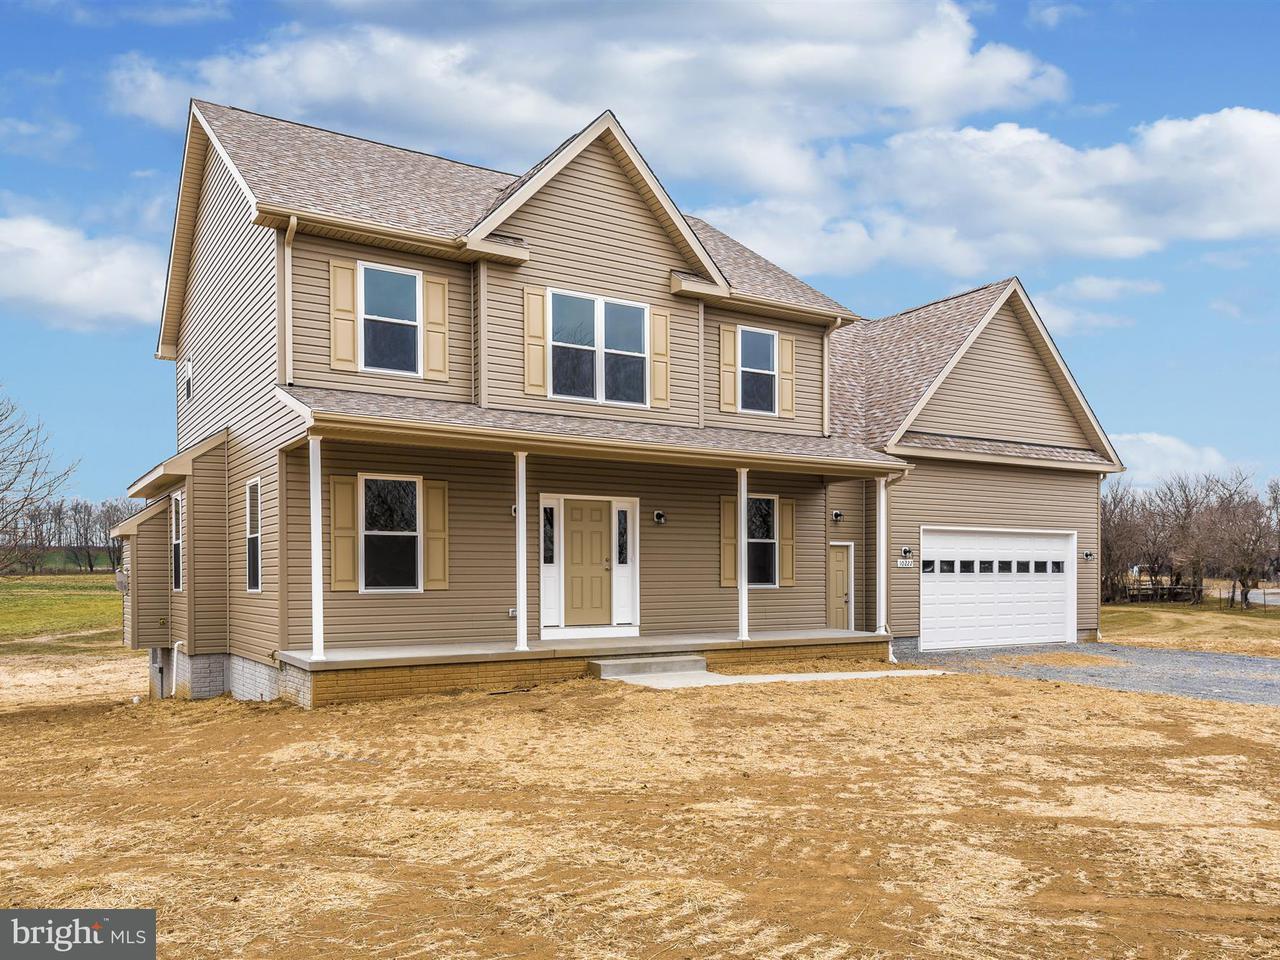 獨棟家庭住宅 為 出售 在 10222 Glade Road 10222 Glade Road Walkersville, 馬里蘭州 21793 美國